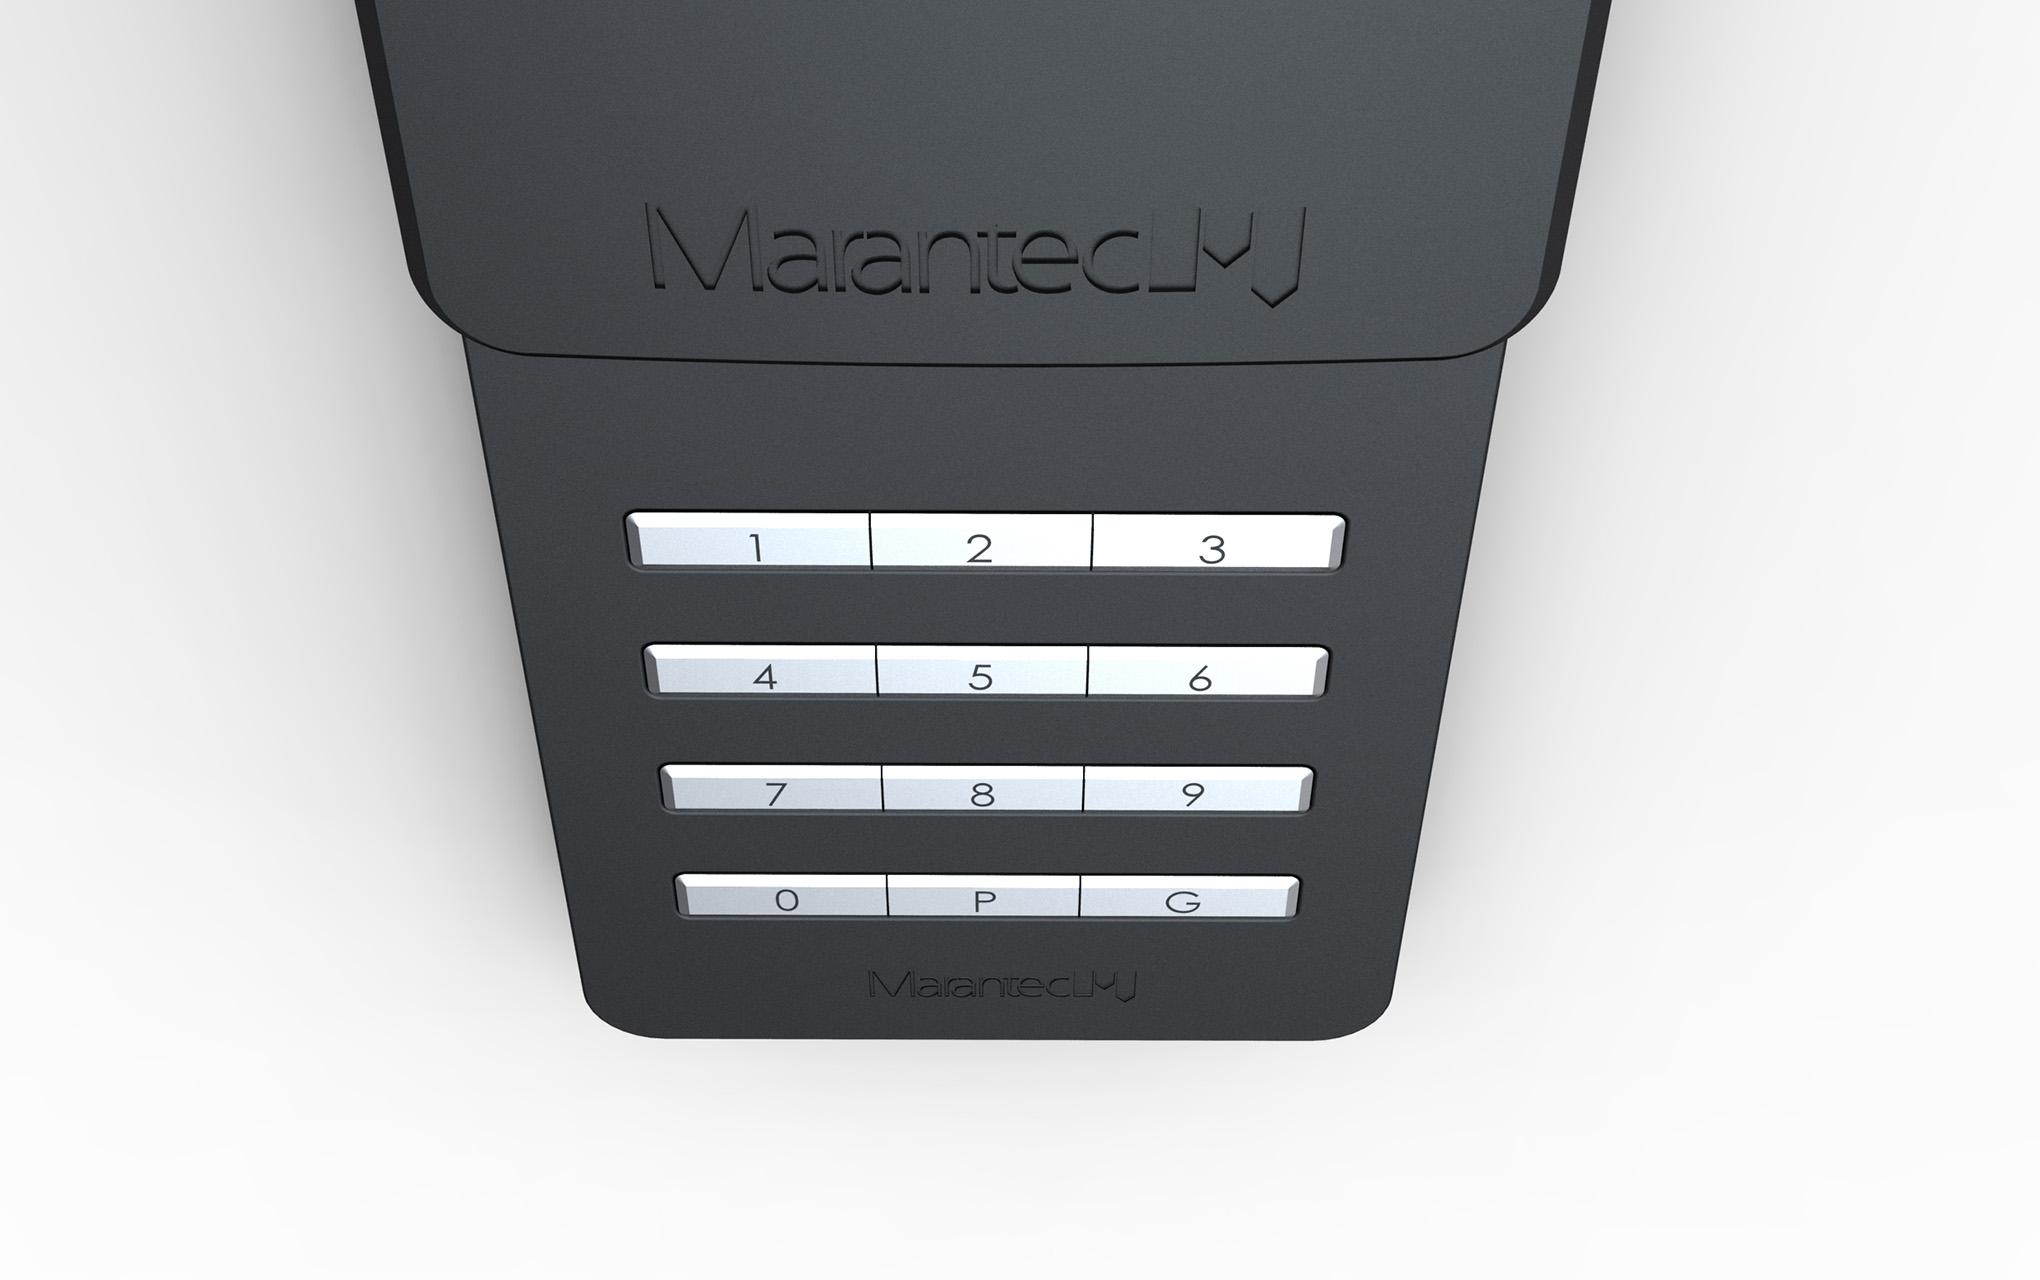 marantec-zutrittskontrolle-tastenfeld